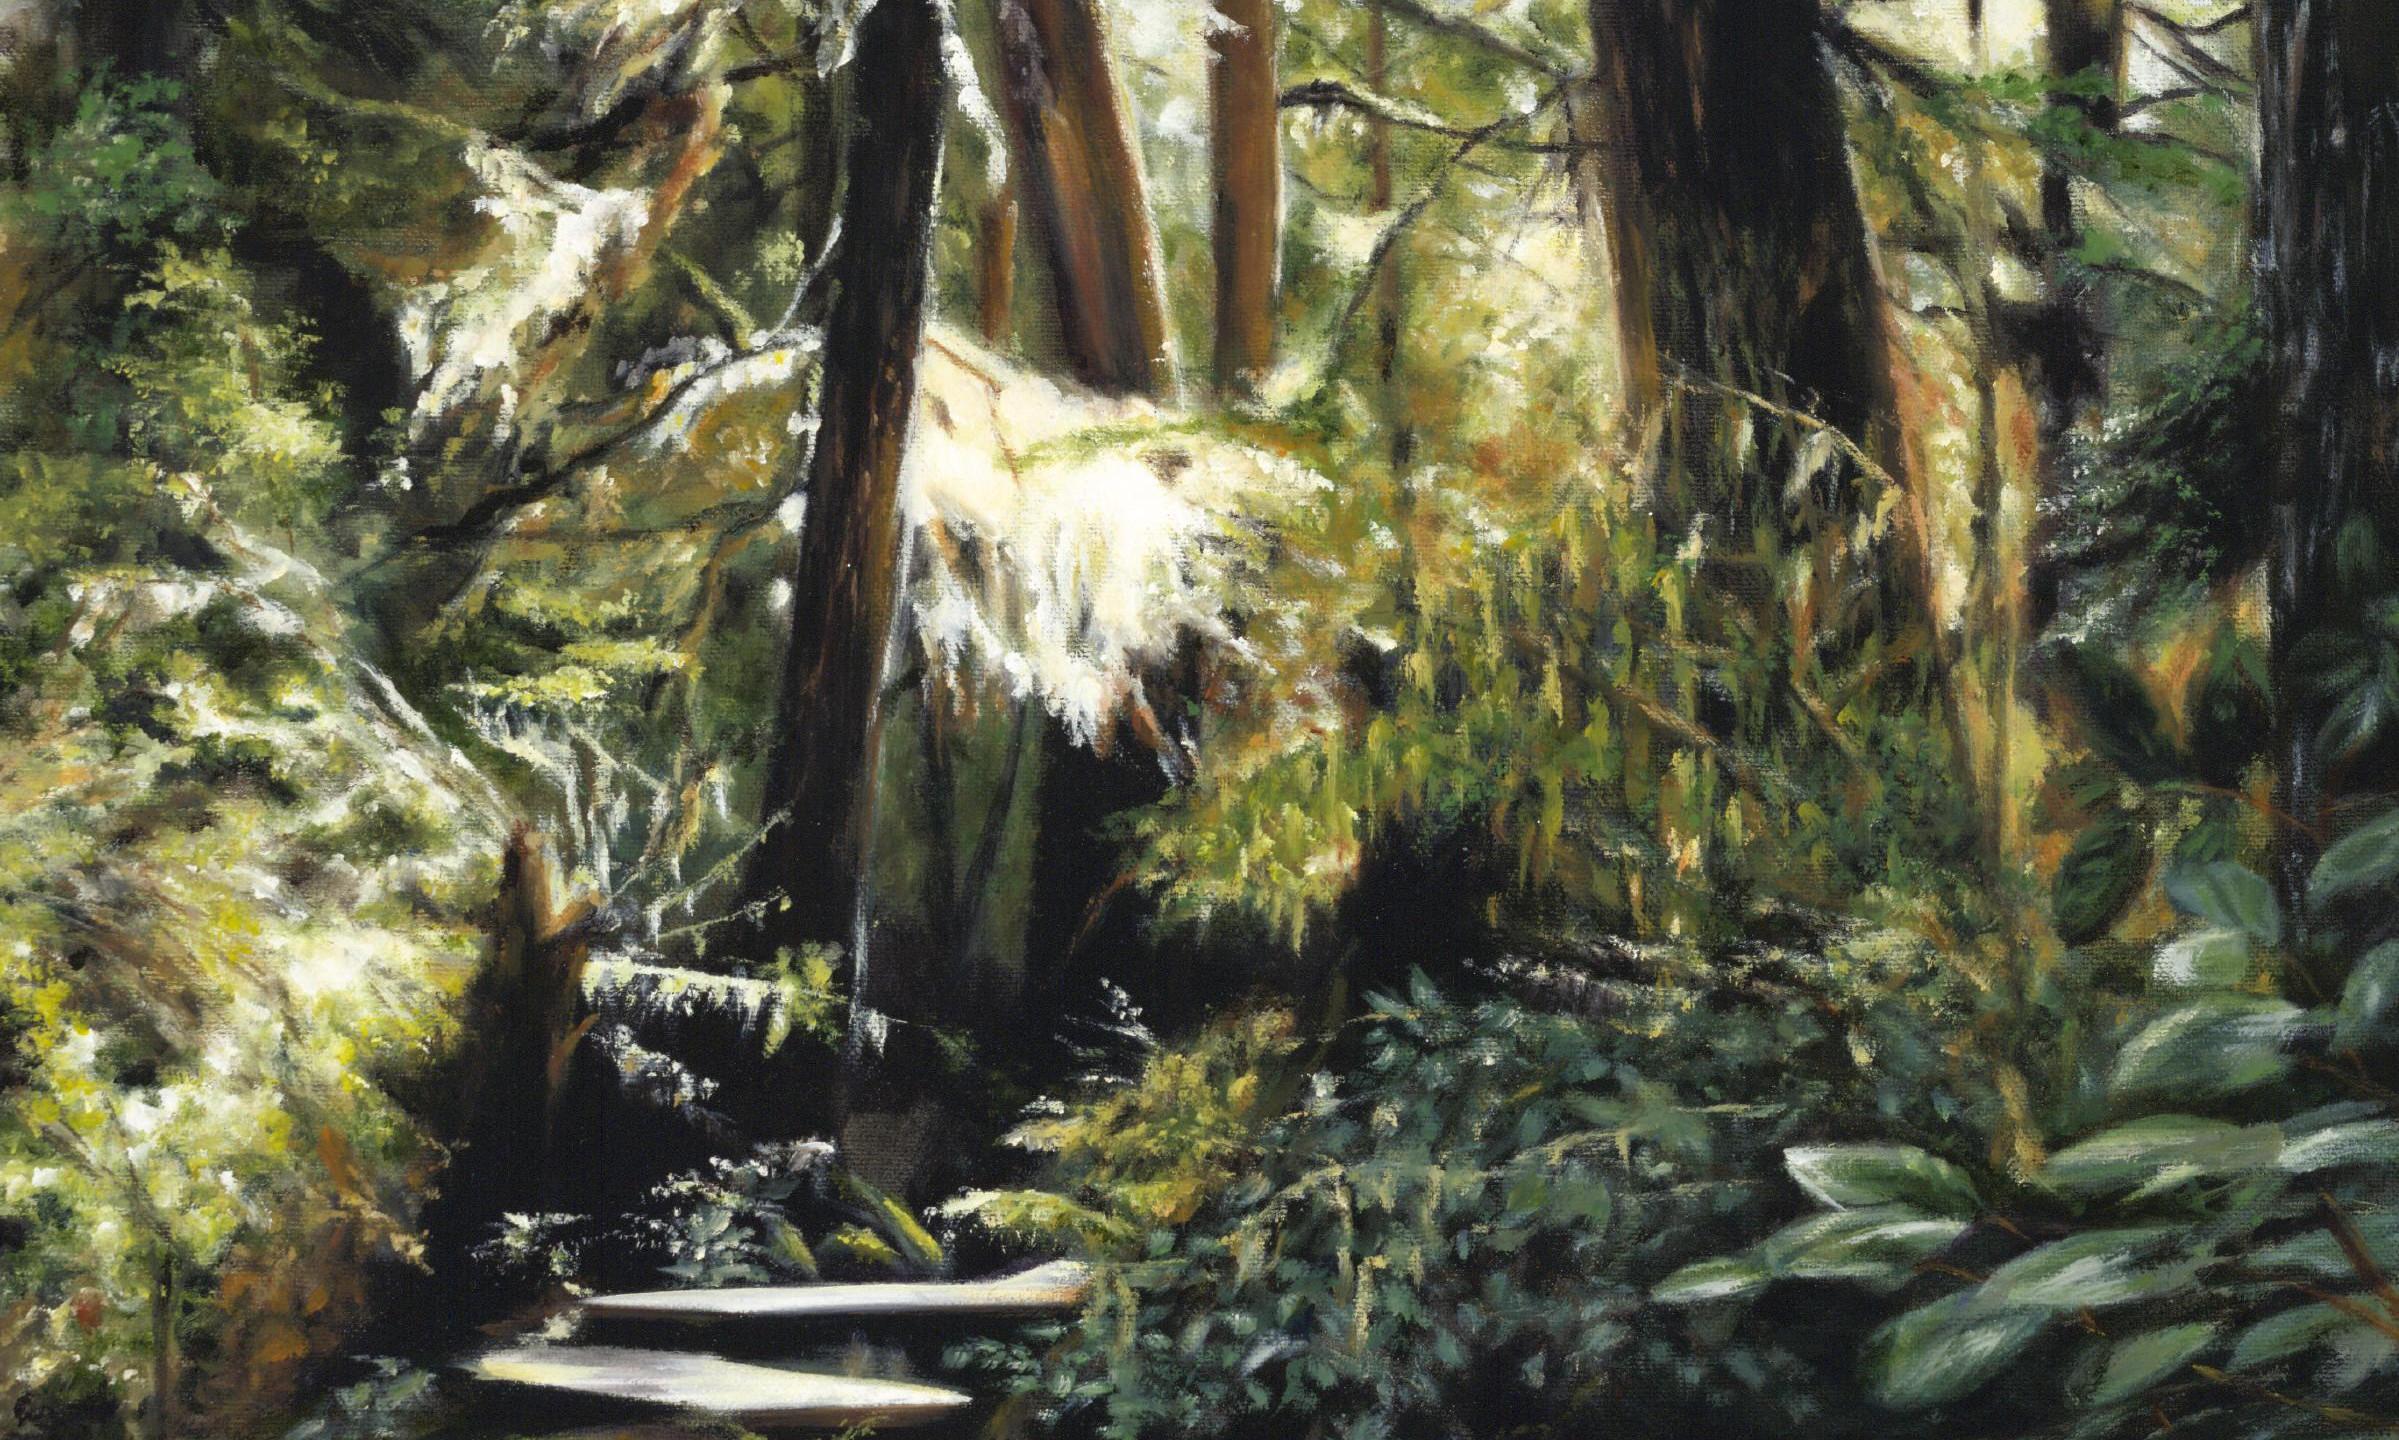 Boileau, Sarah - Schooner Cove Trail